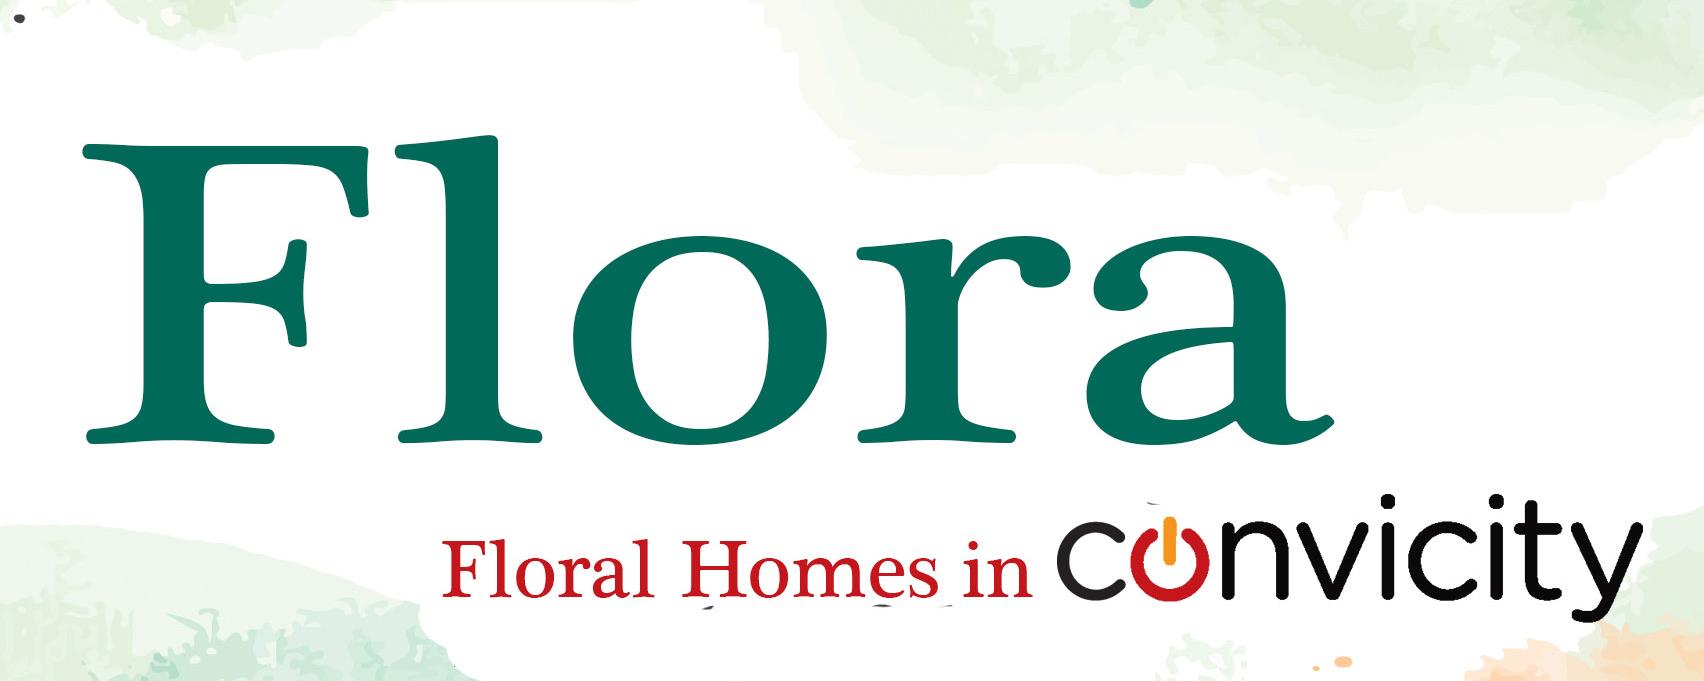 LOGO - Flora Homes Convicity